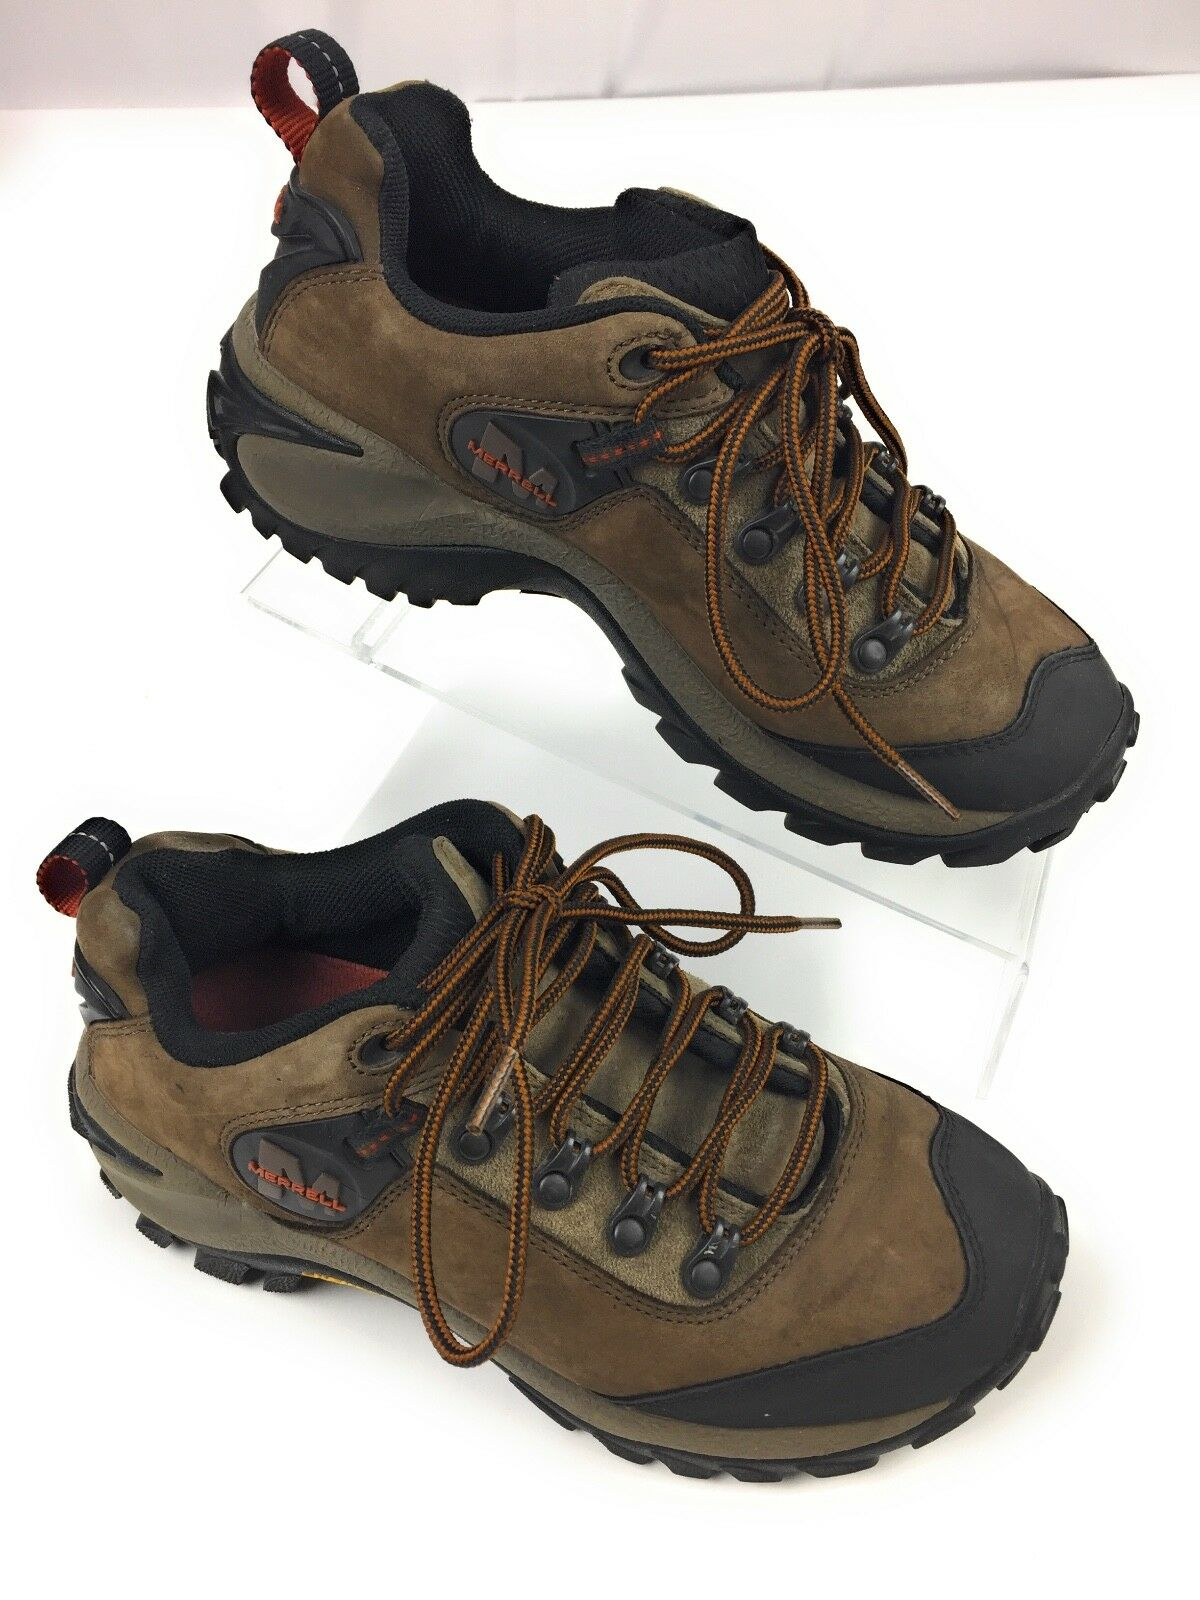 Merrell Phaser Inferno Hiking Trail shoes Dark Brown Women's 6 US, 3.5 EUR